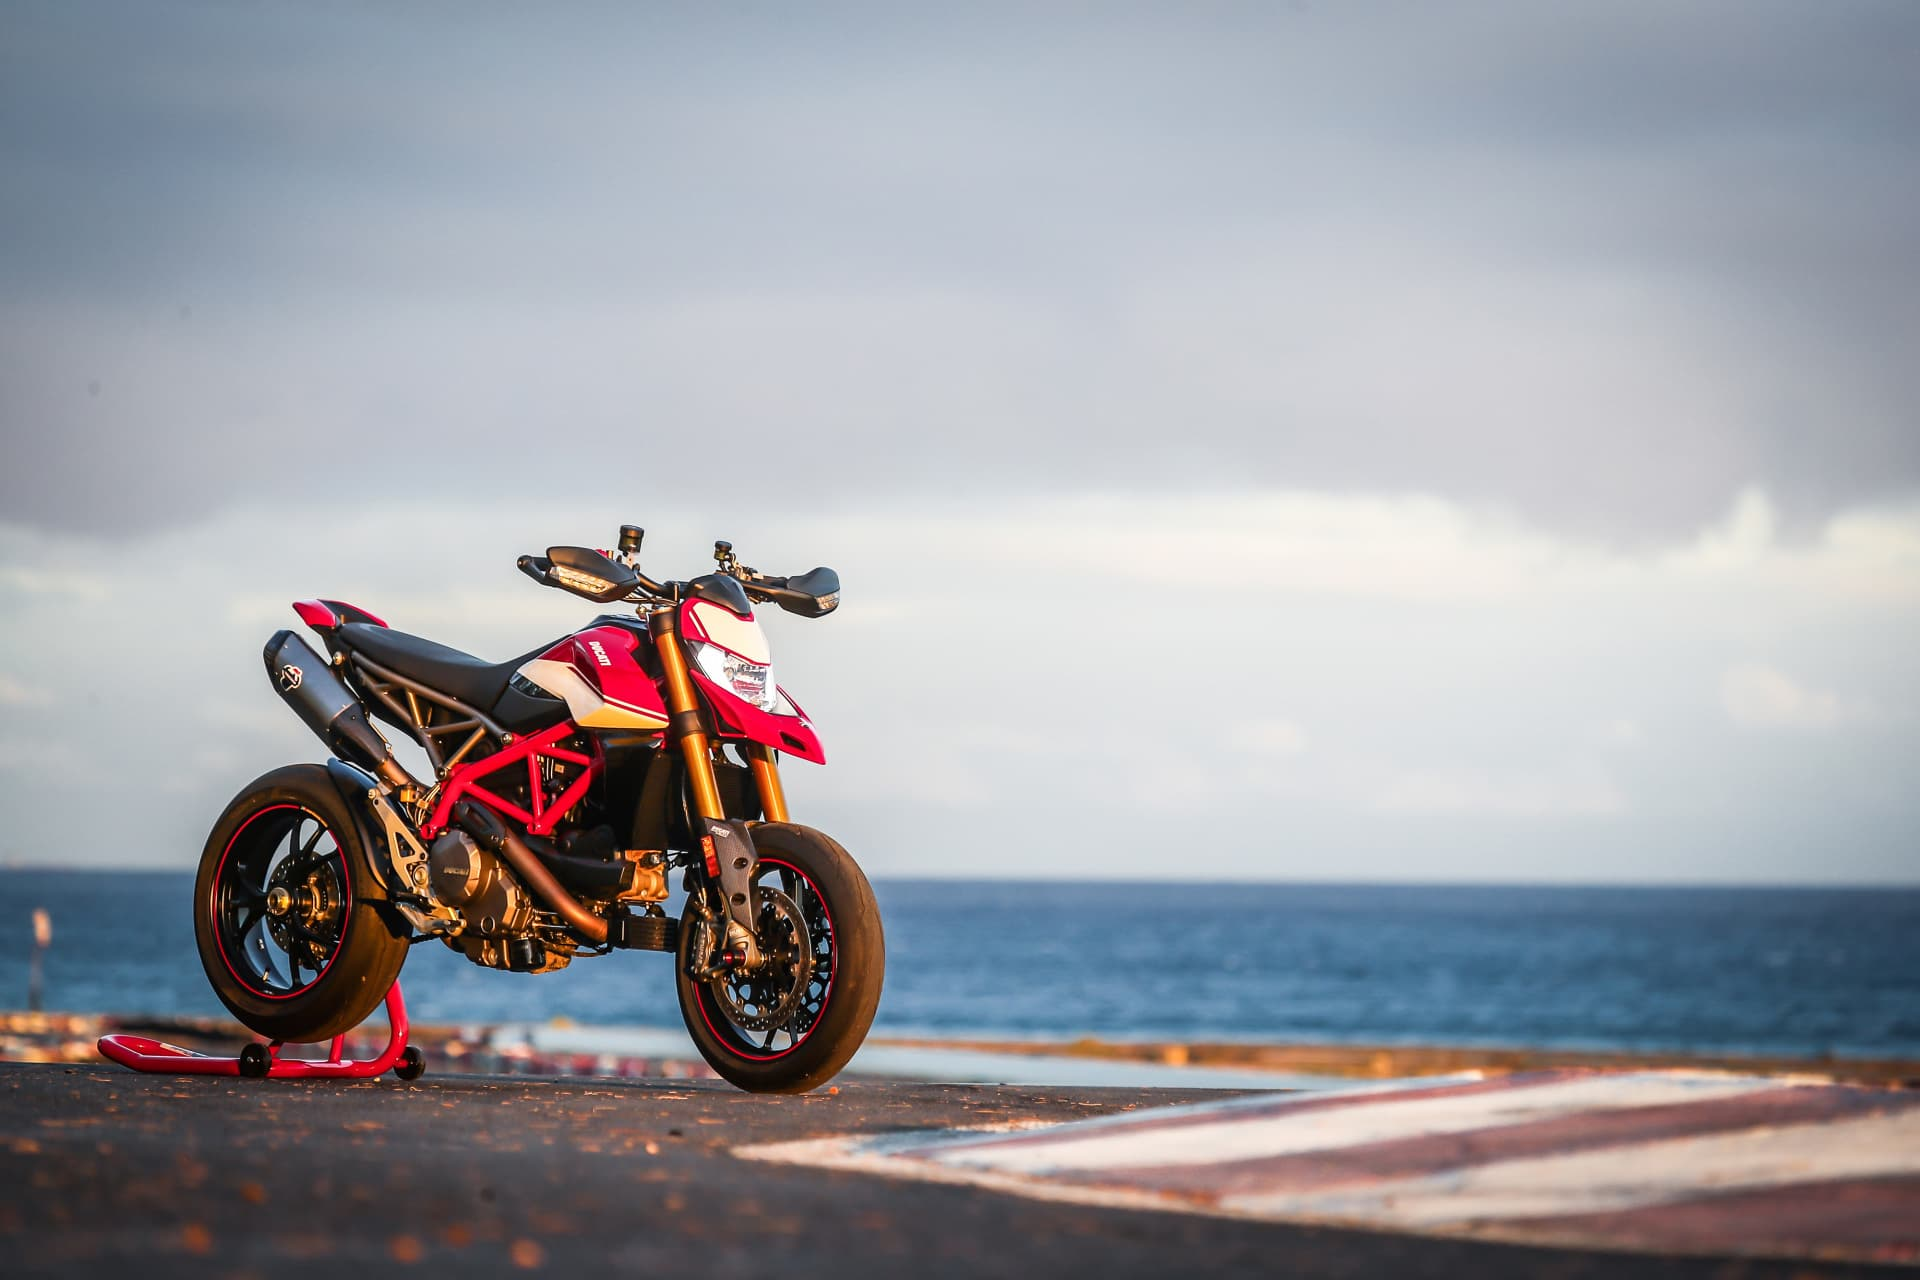 Ducati Hypermotard 950 Sp Static 06 Uc70304 Mid